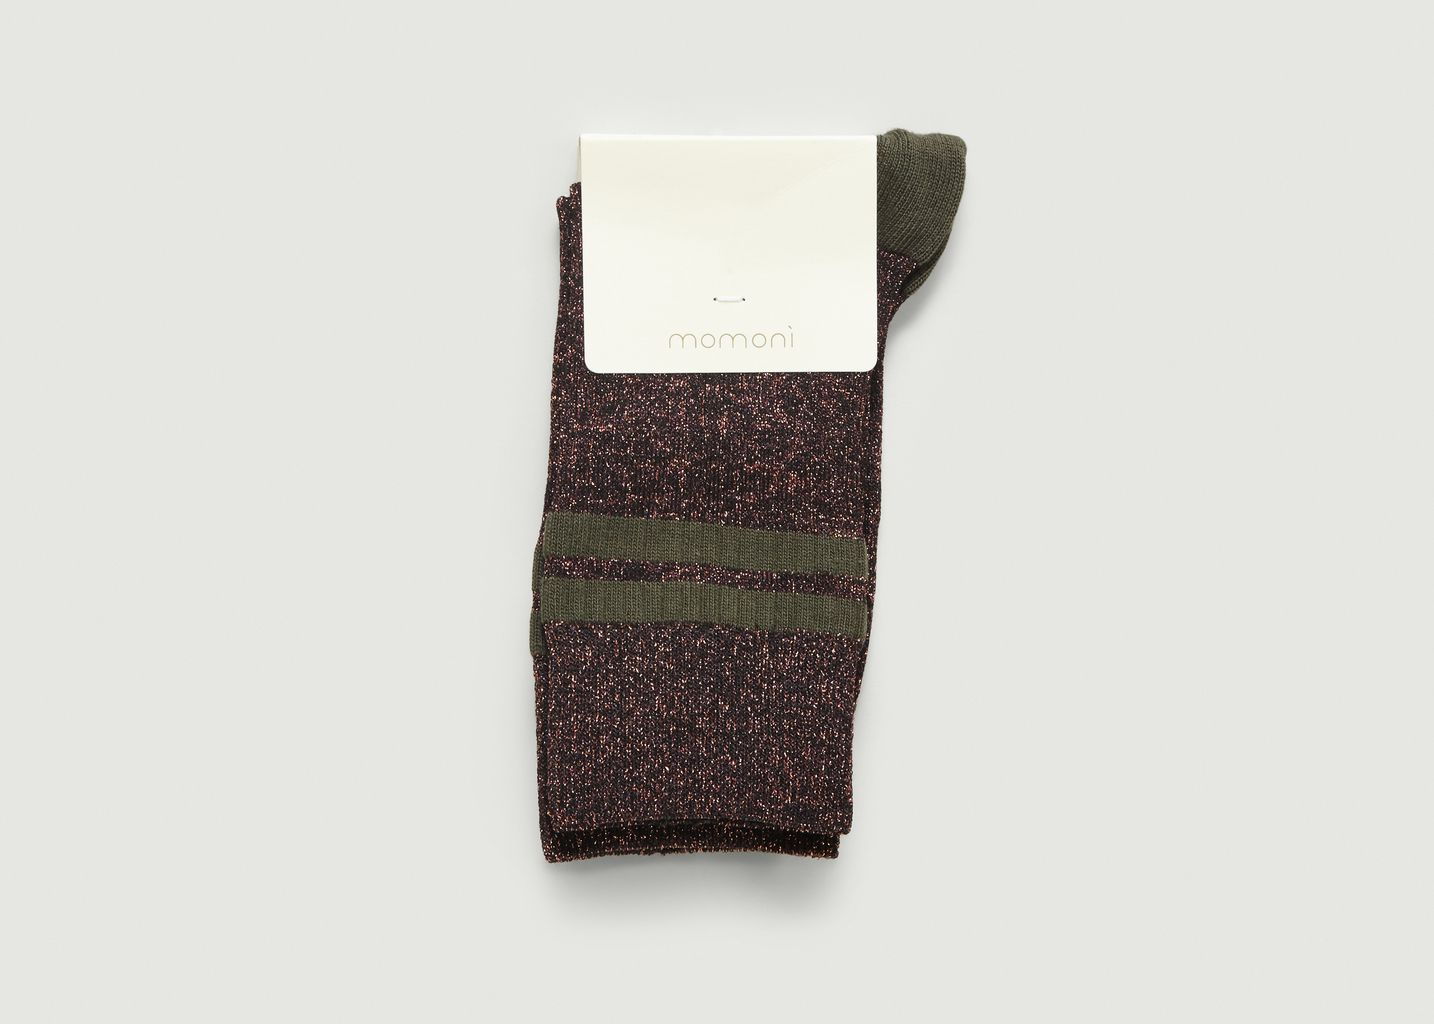 Chaussettes Vanna - Momoni